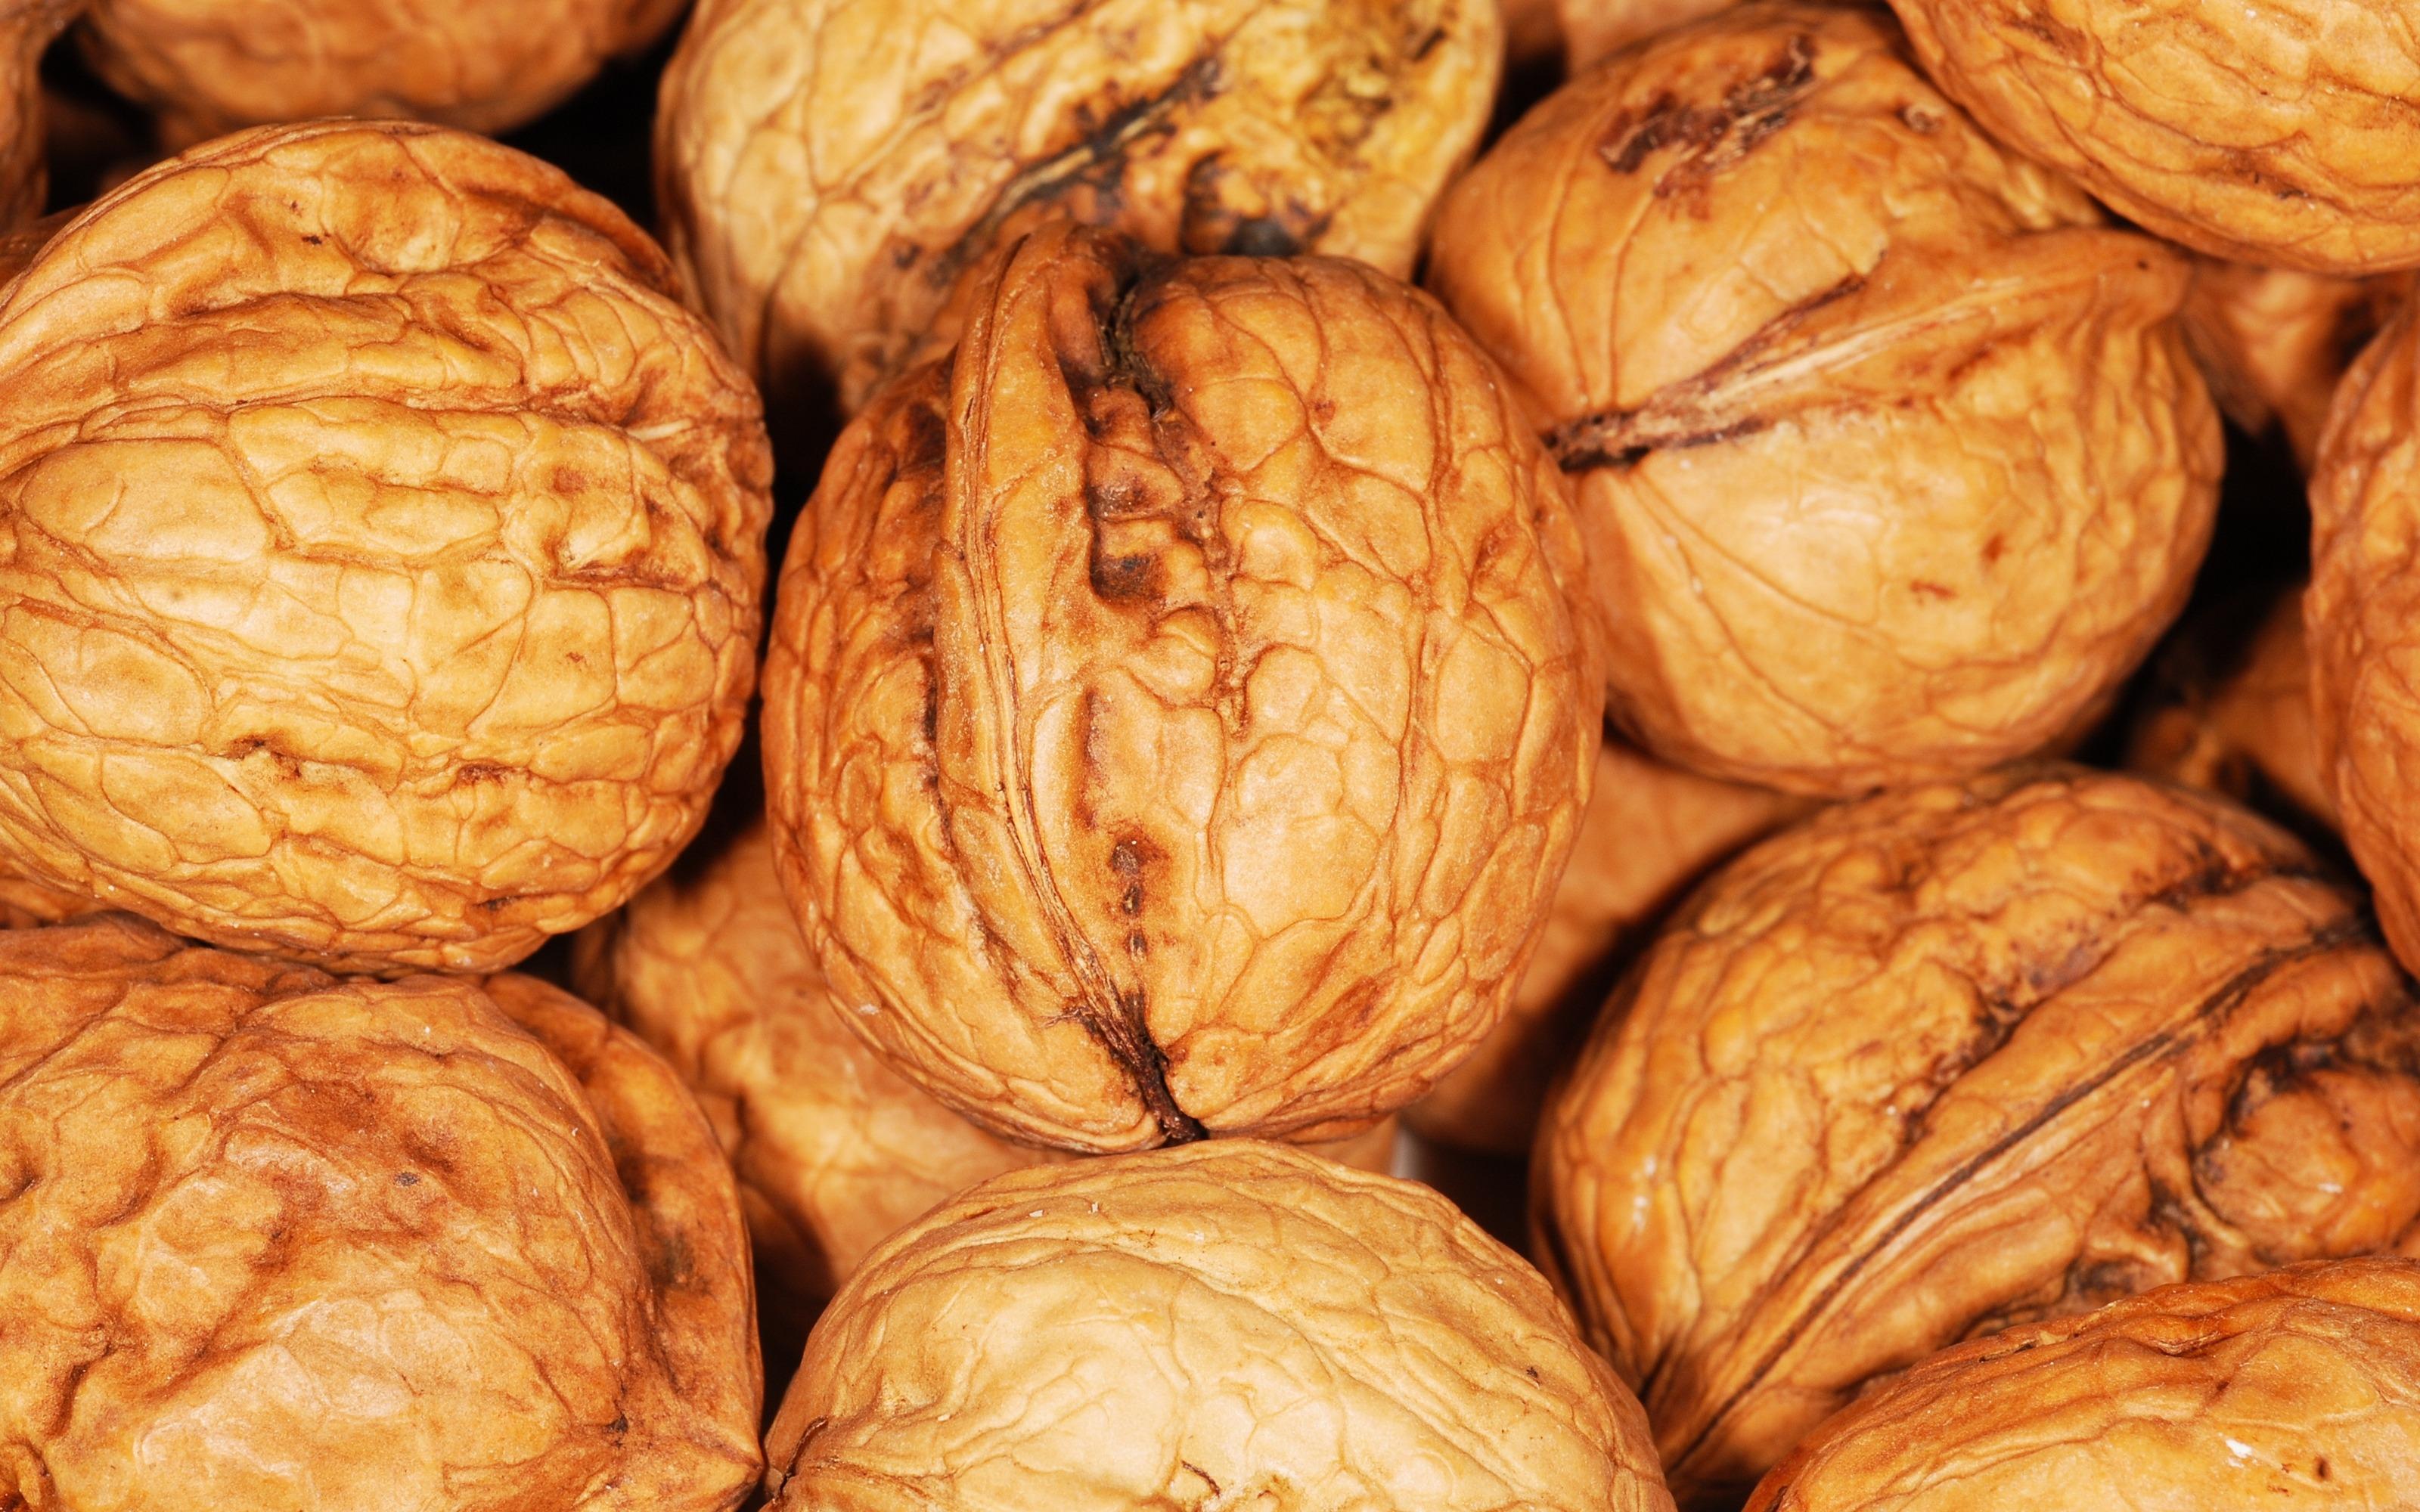 Gambar Makanan Menghasilkan Coklat Camilan Buah Kenari Merapatkan Gila Calabaza Tanaman Berbunga Juglans Labu Musim Dingin Biji Kacang Kacang Pohon 3200x2000 1155638 Galeri Foto Pxhere